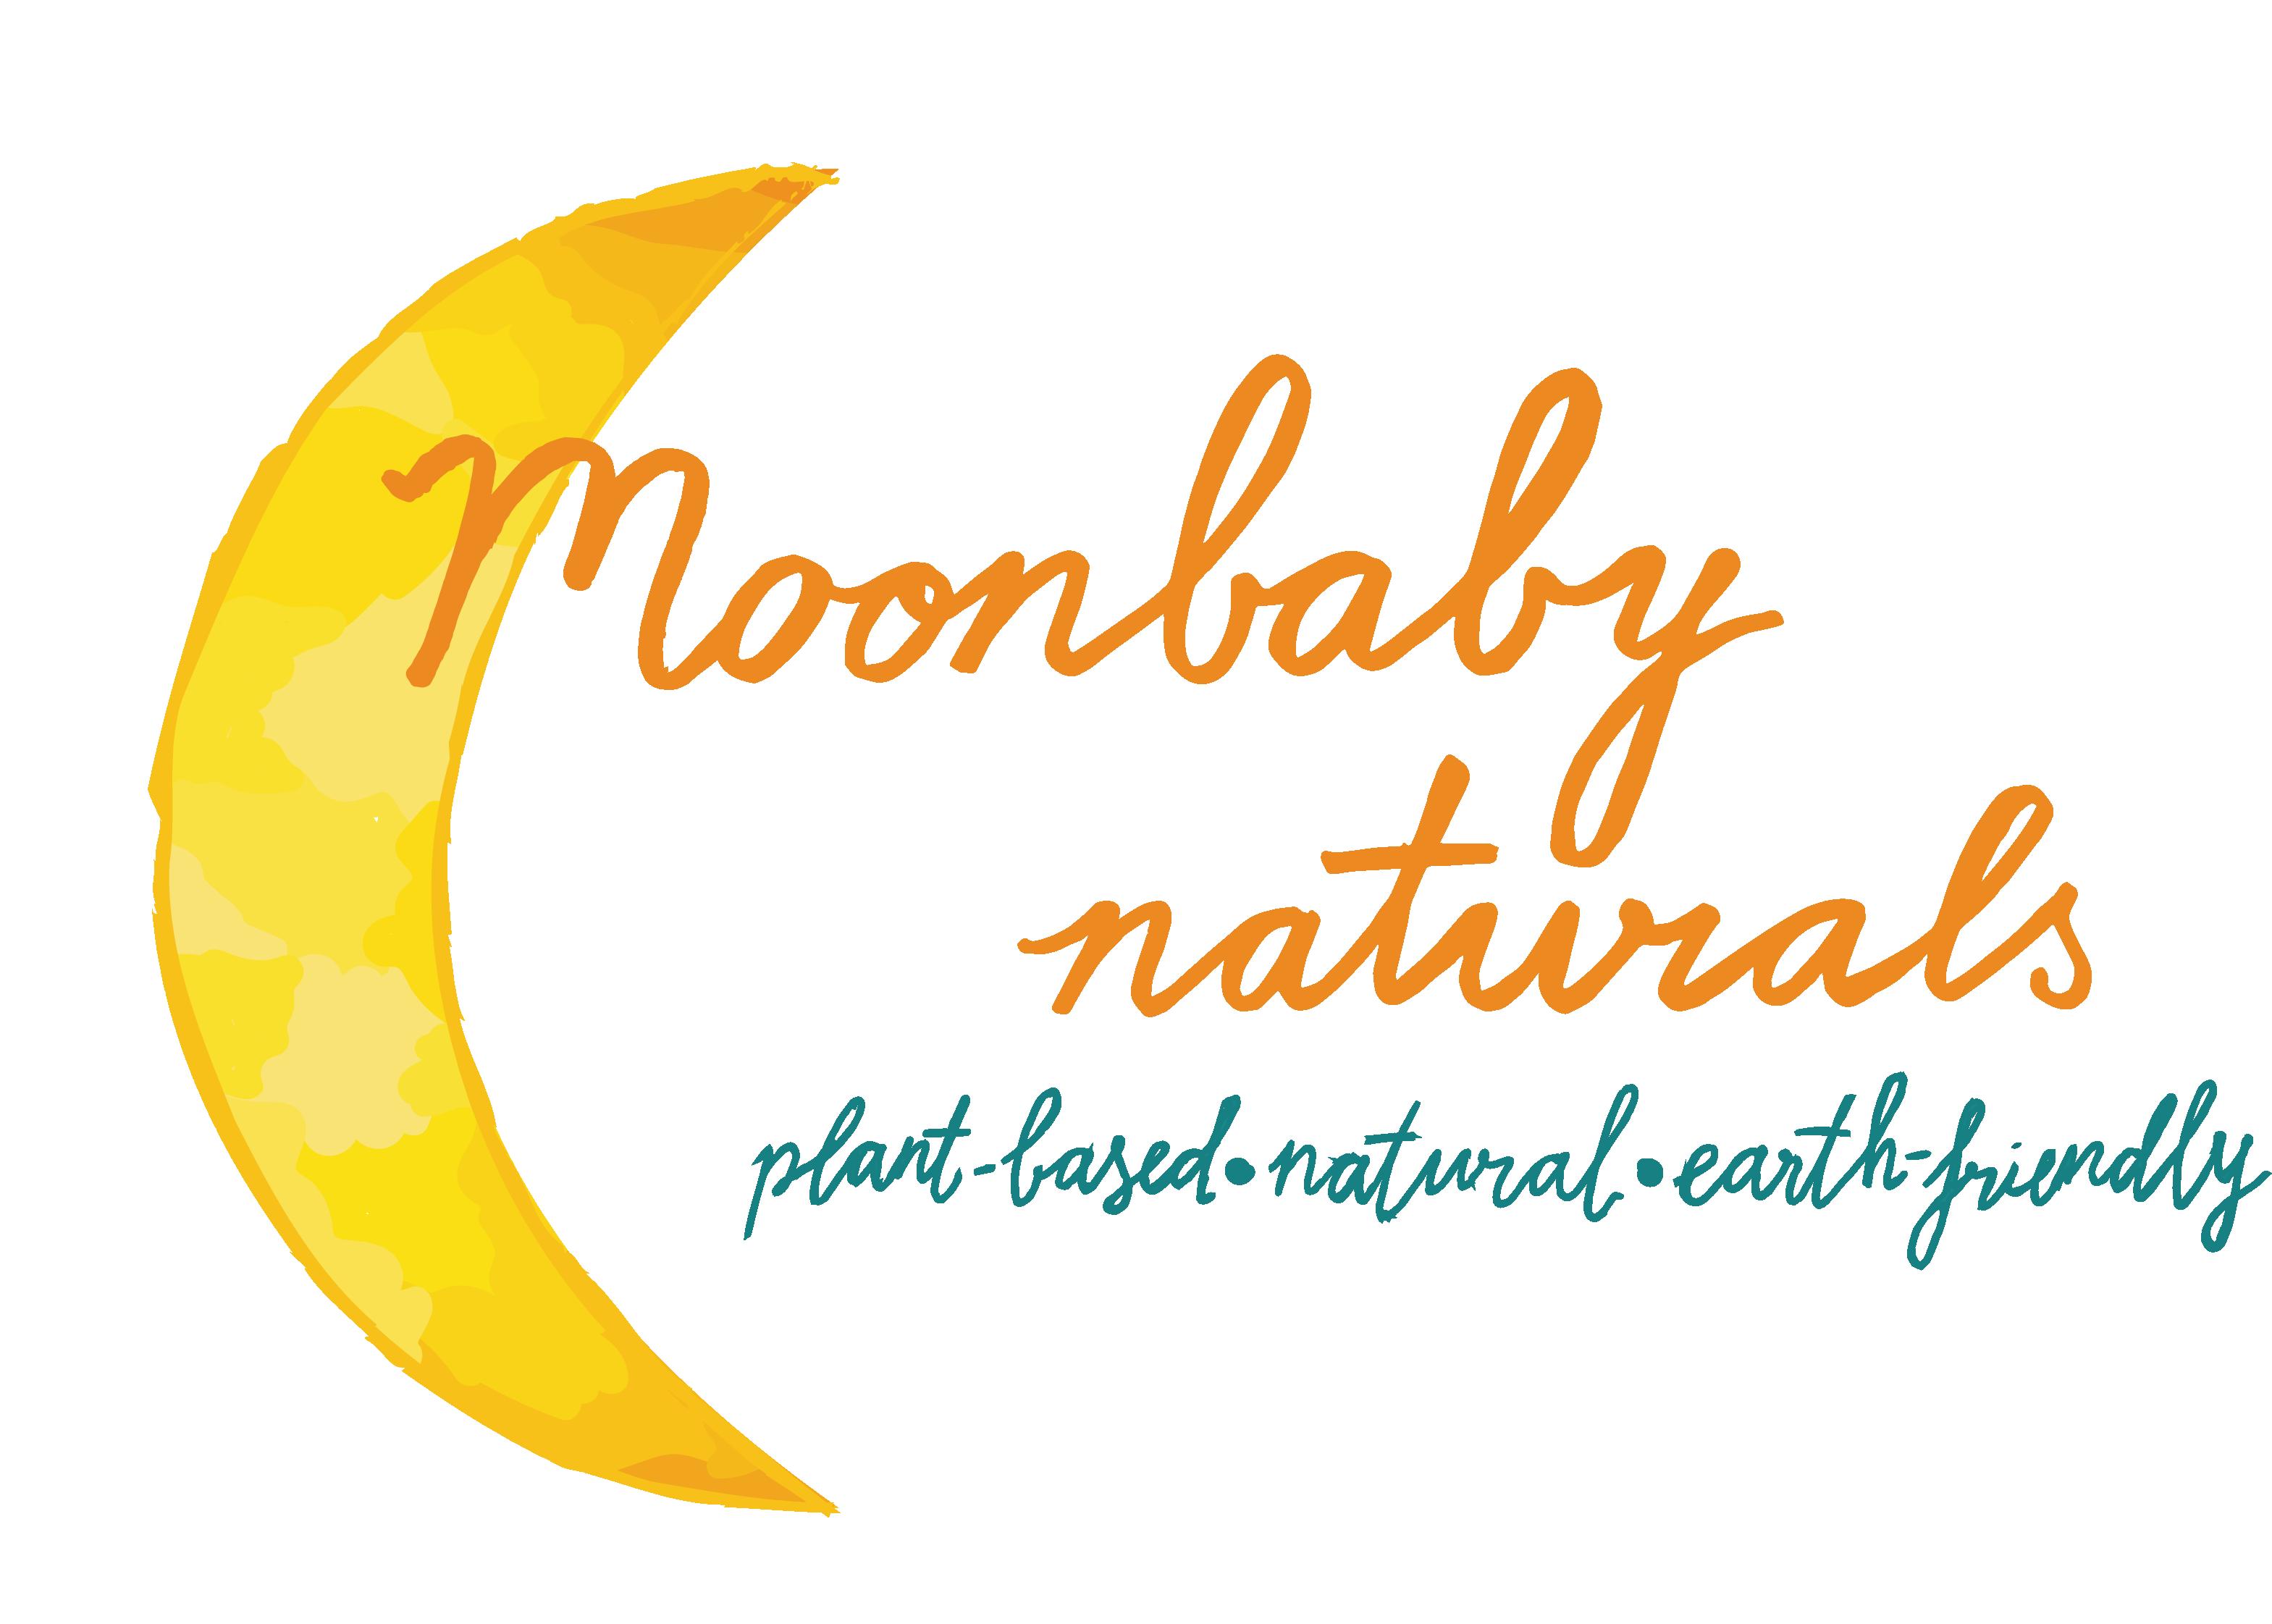 Moonbaby Naturals